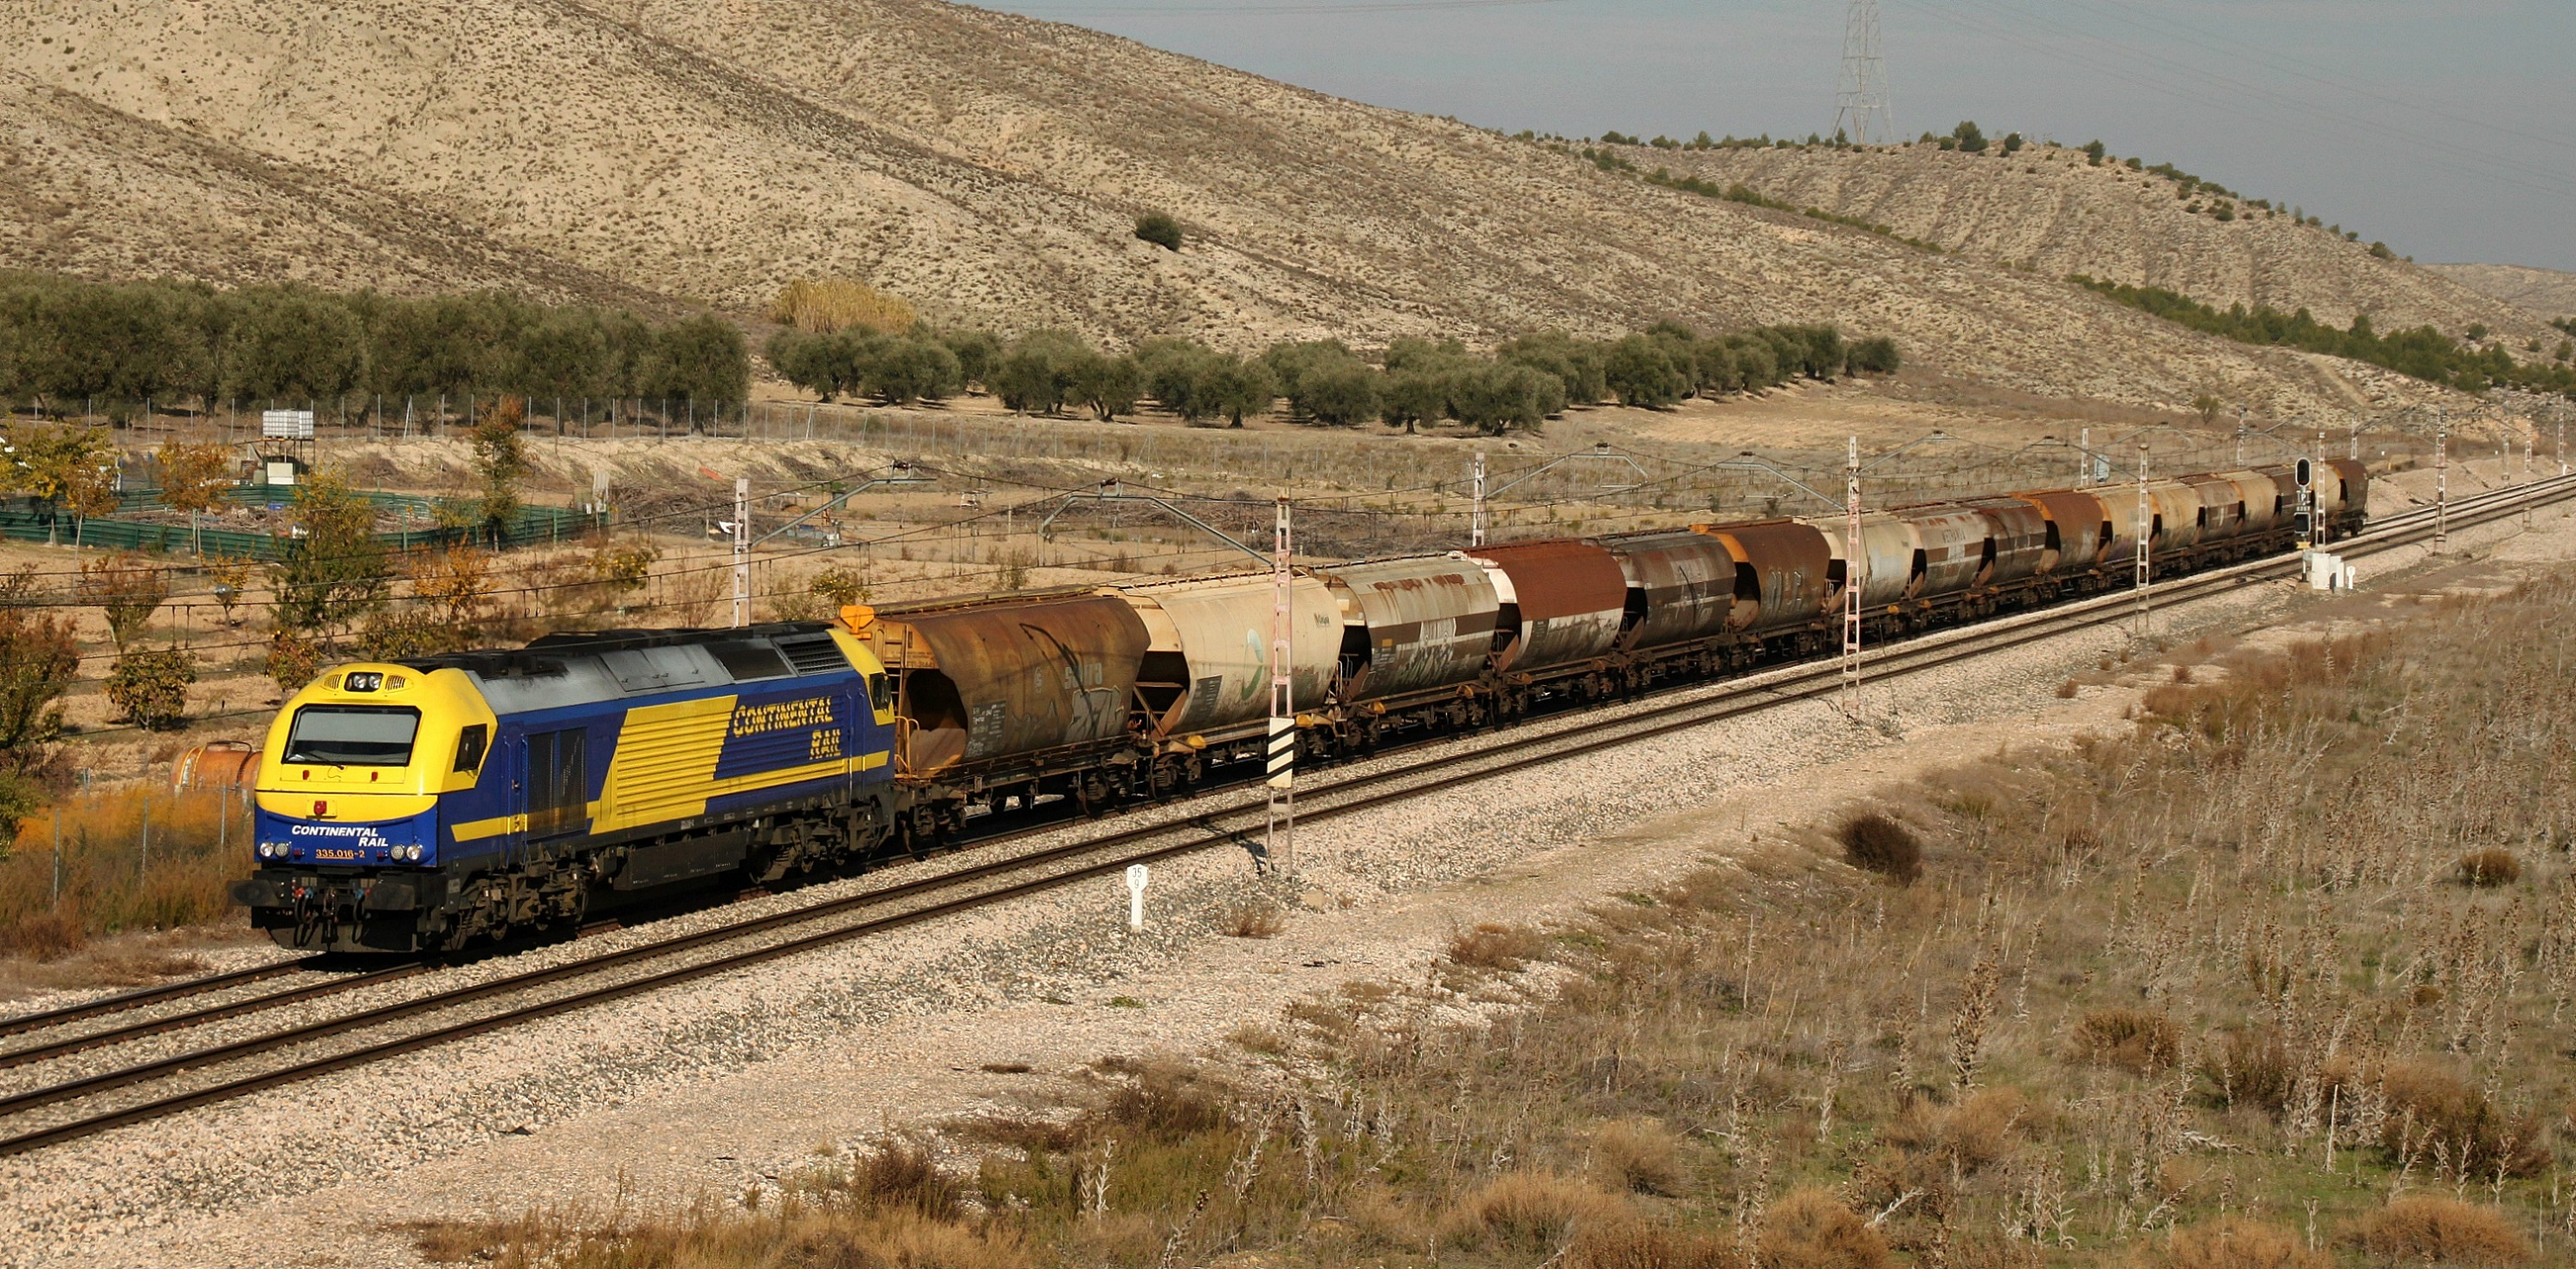 Fotos de trenes de carga 81